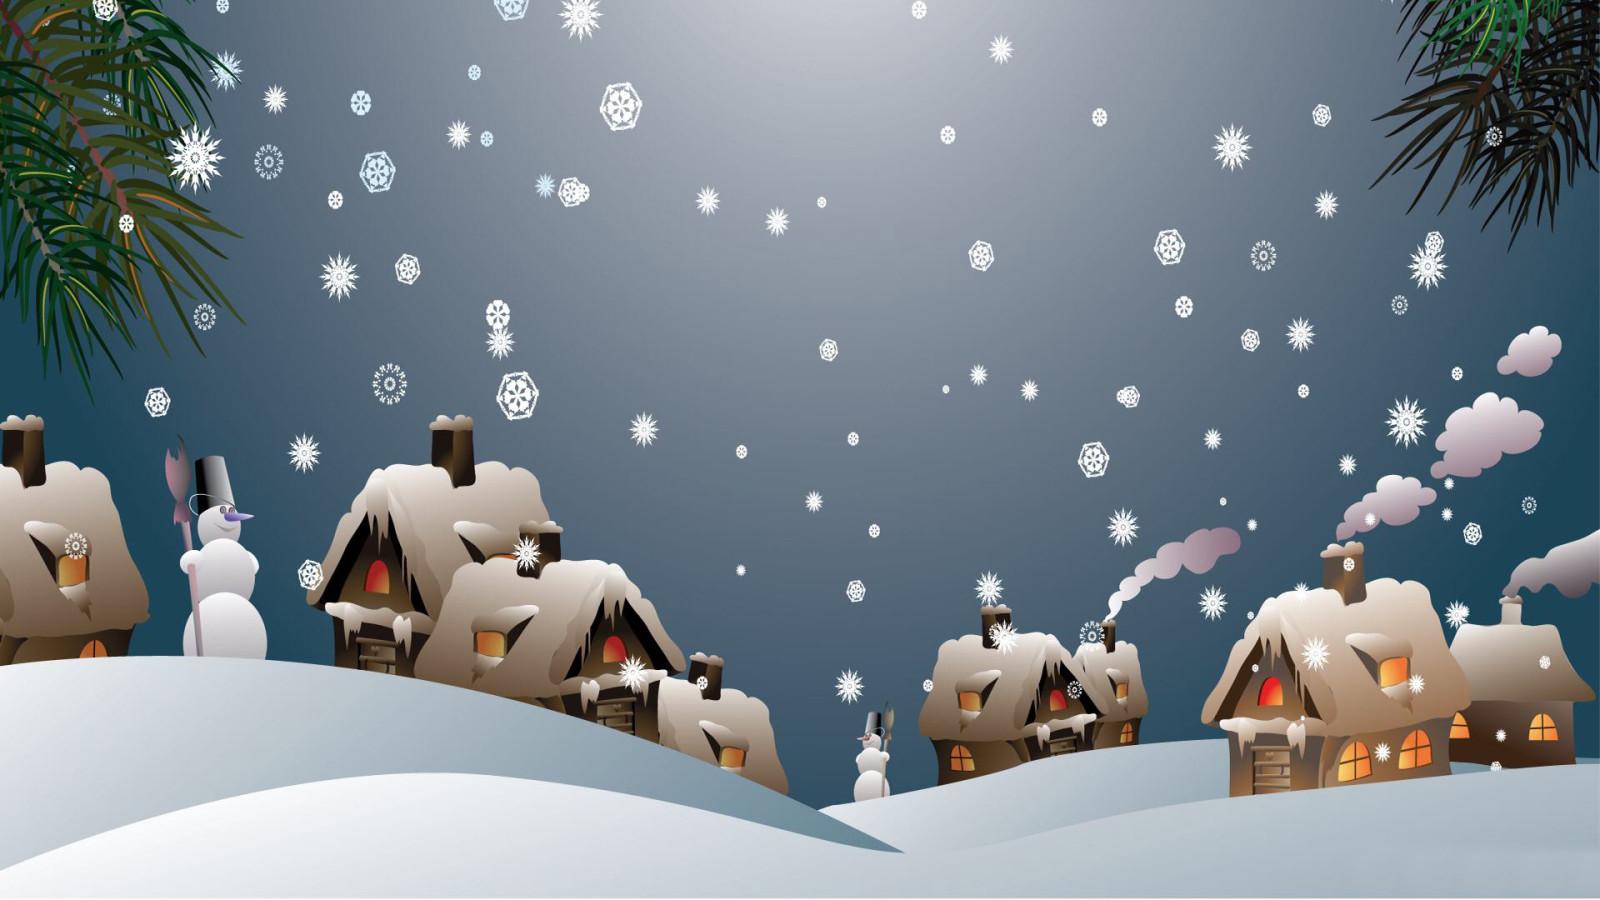 Fond d 39 ecran de noel gratuit avec neige qui tombe for Sfondi natalizi 1920x1080